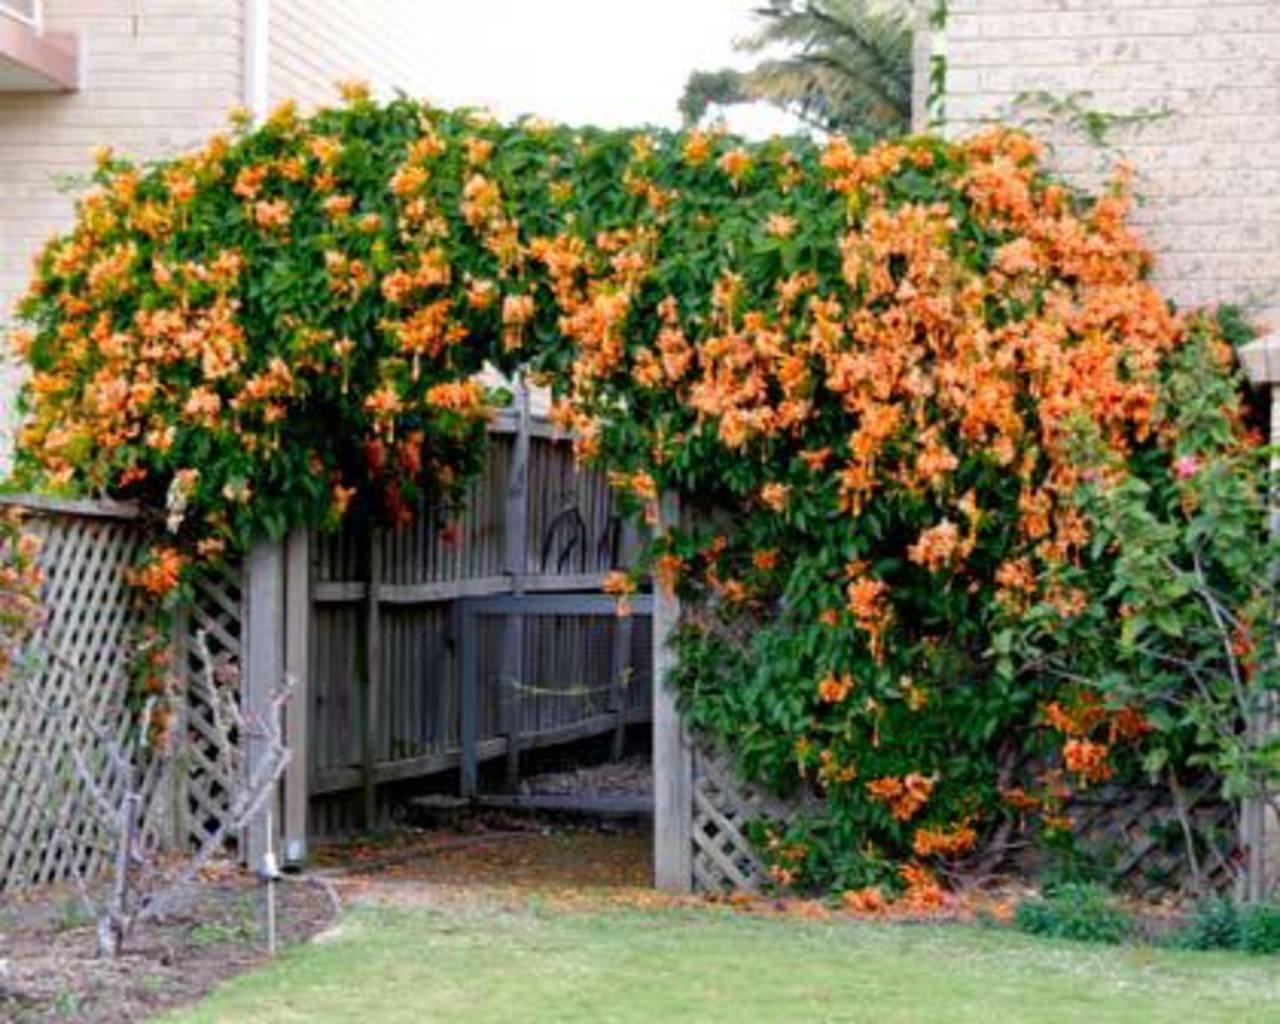 Plantas que dan belleza a todo sitio